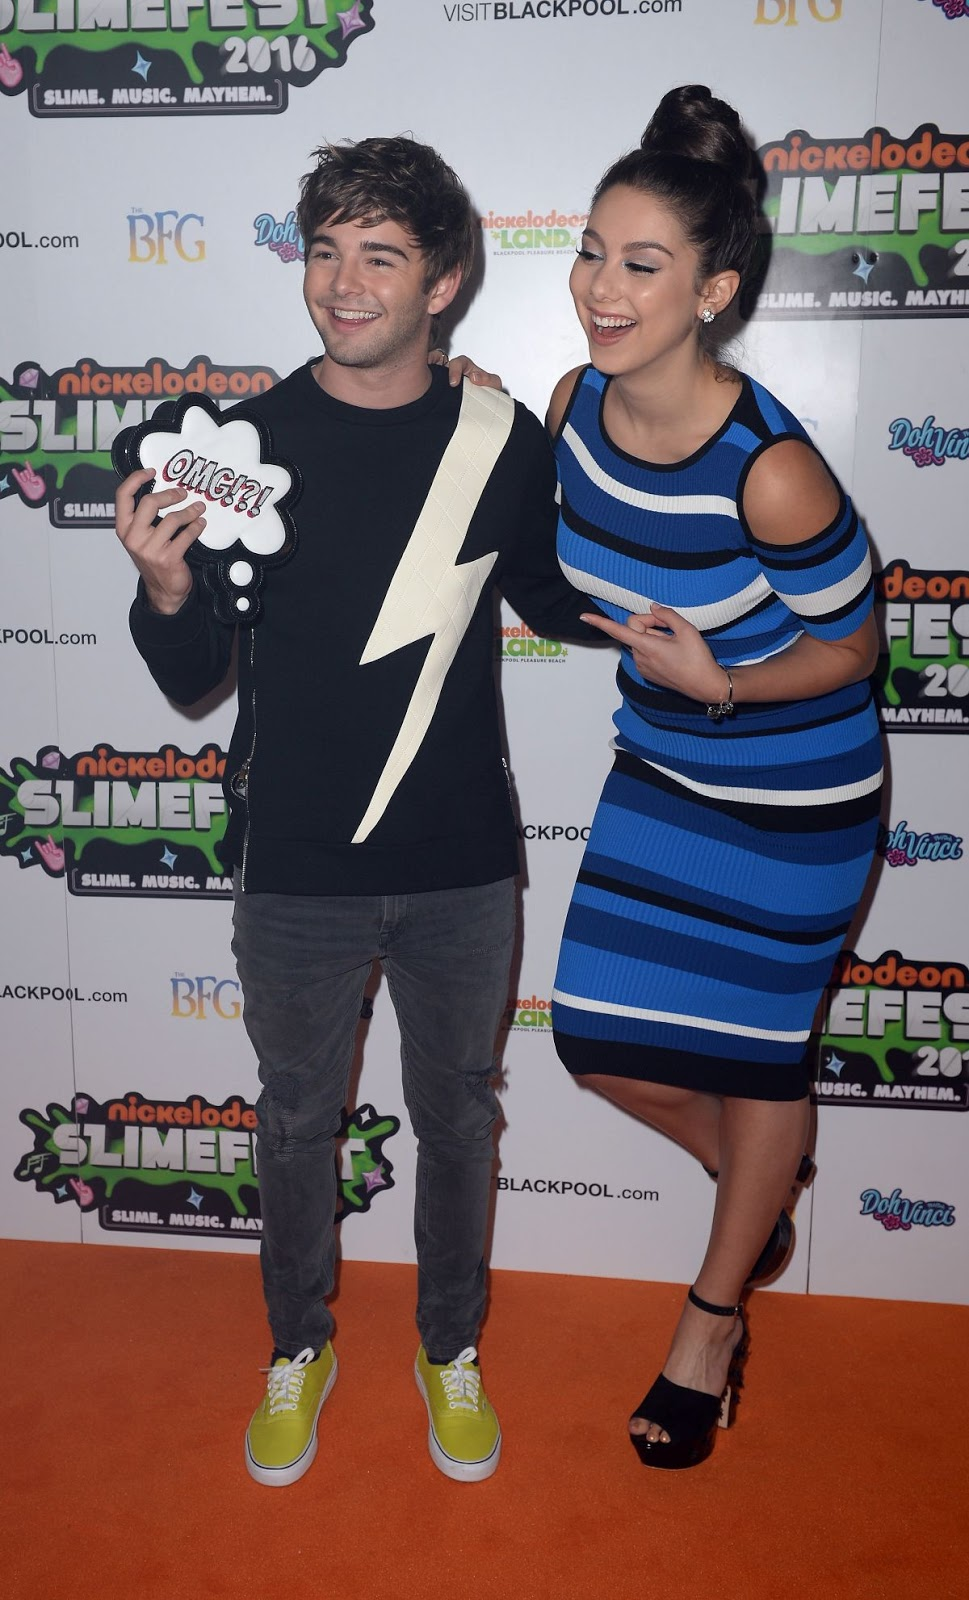 Kira Kosarin At First UK Nickelodeon Slimefest In Blackpool